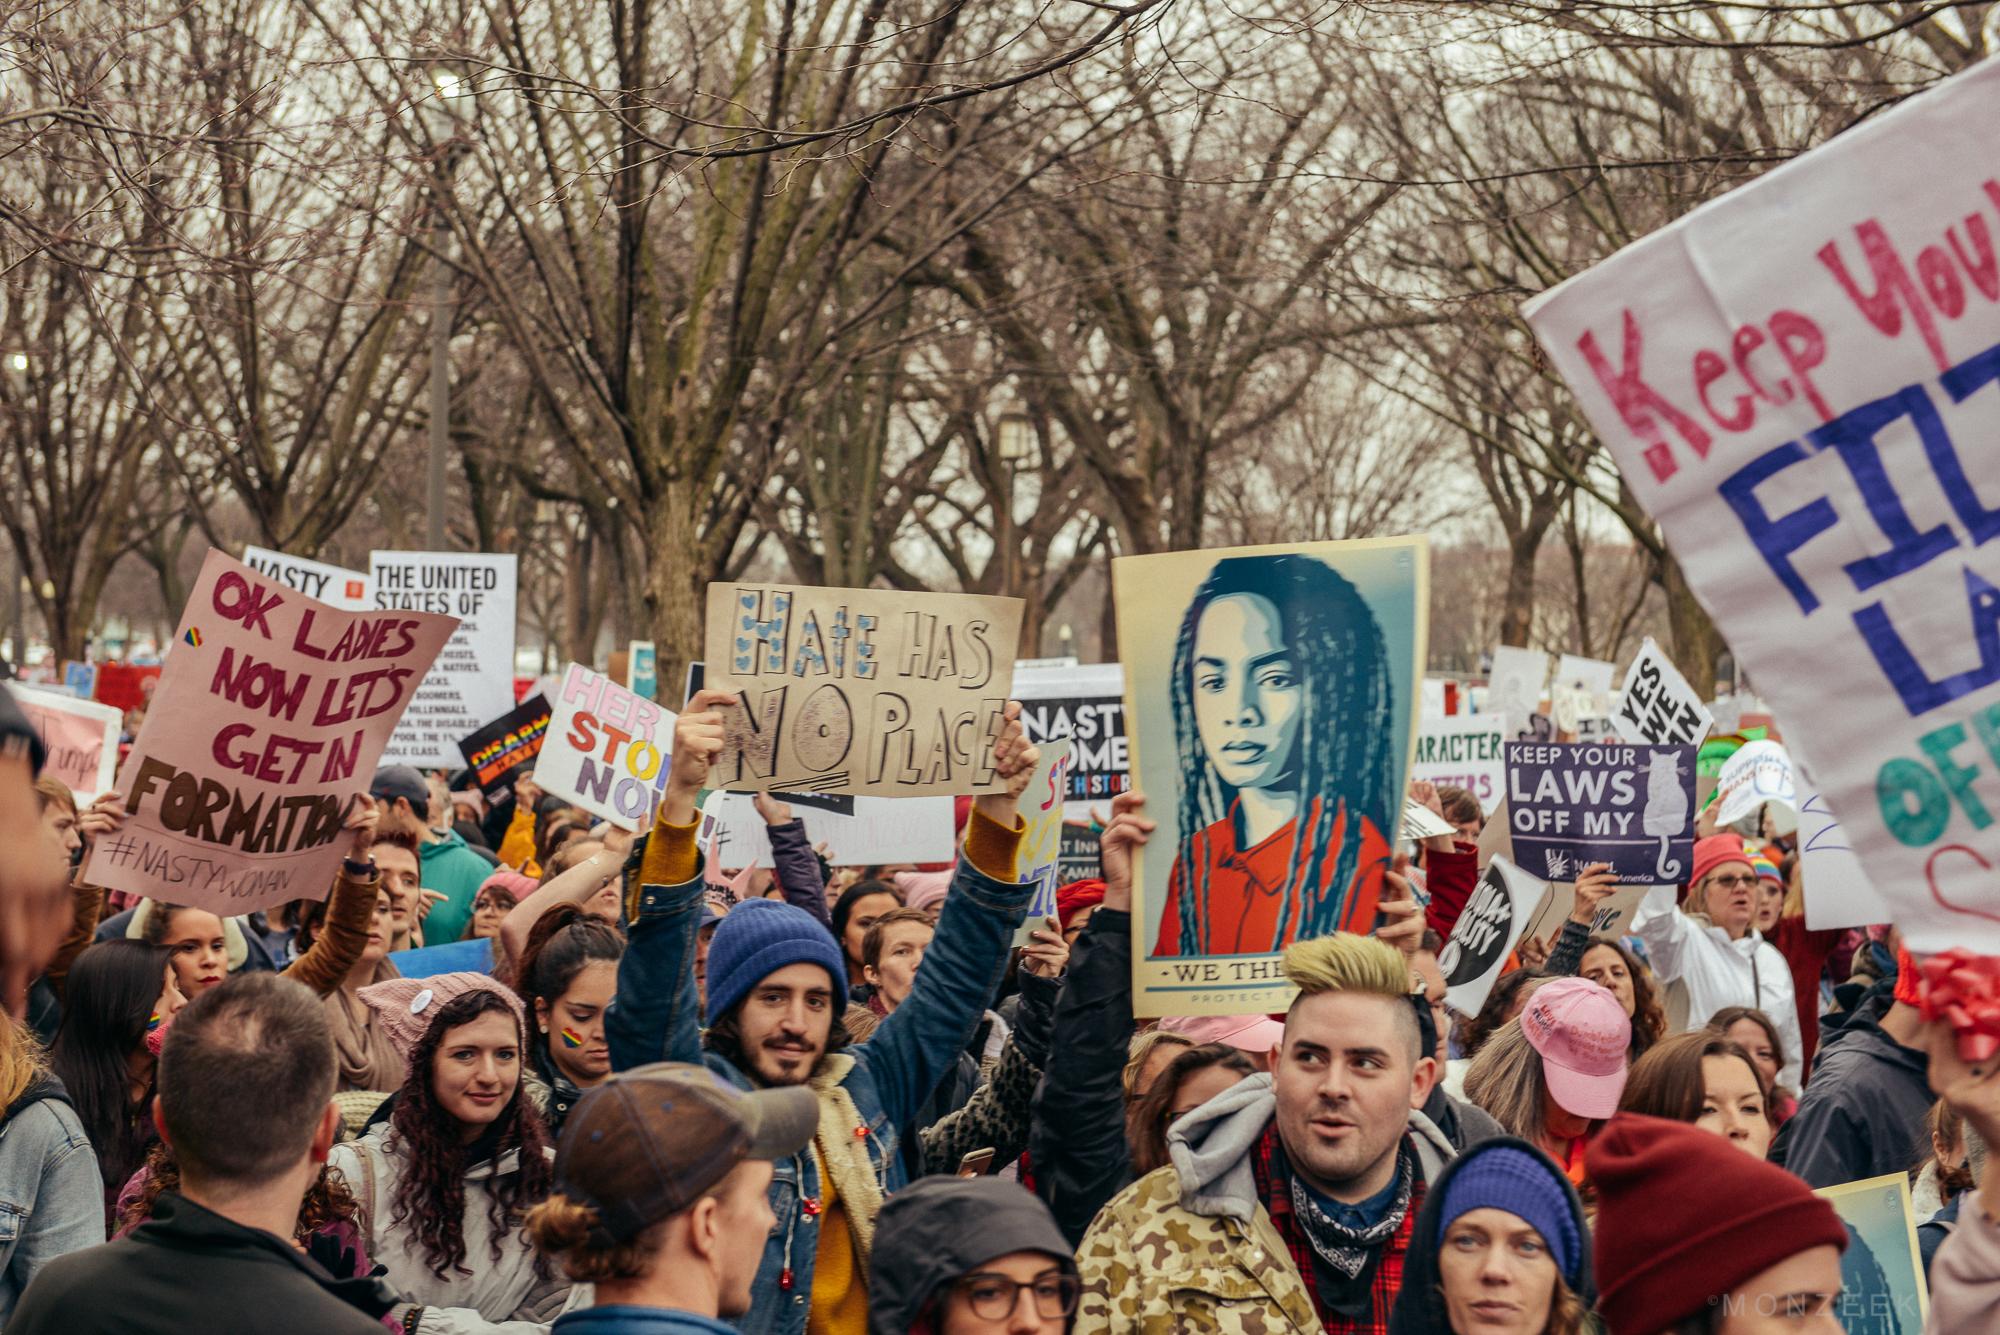 20170121-womens-march-dc-2704.jpg